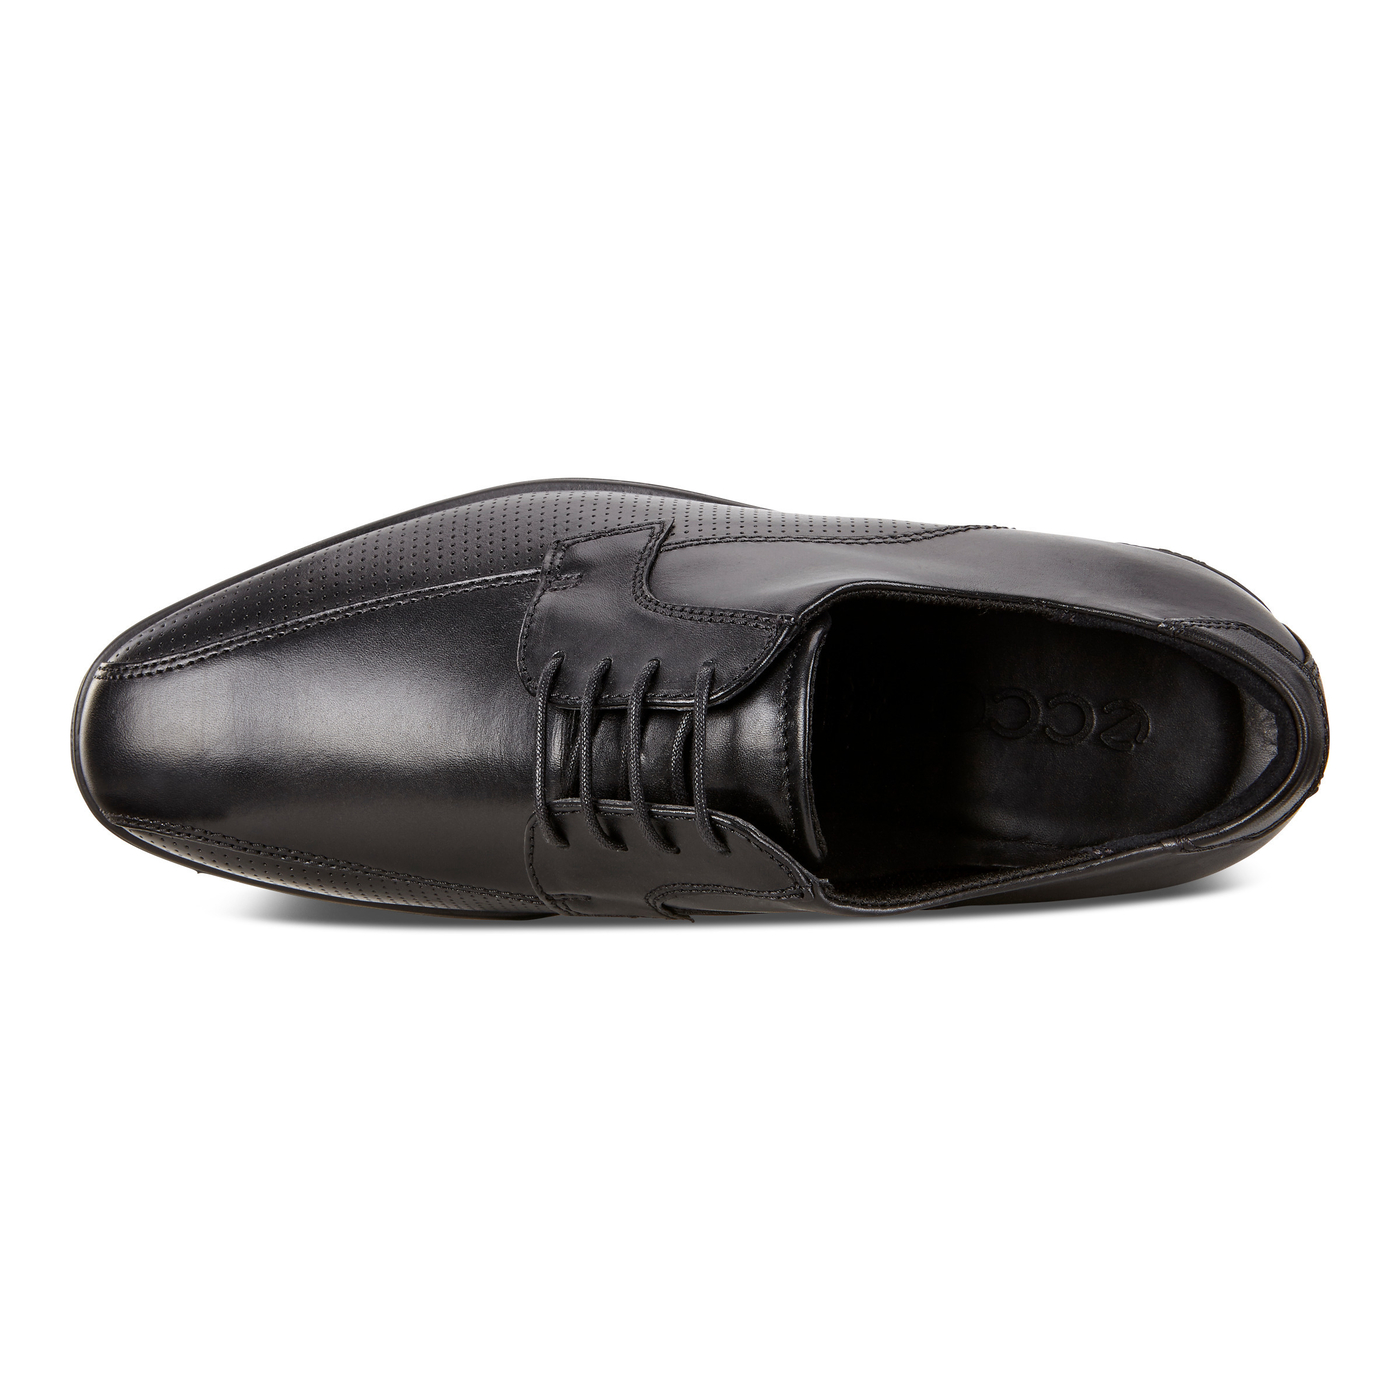 ECCO MELBOURNE Shoe